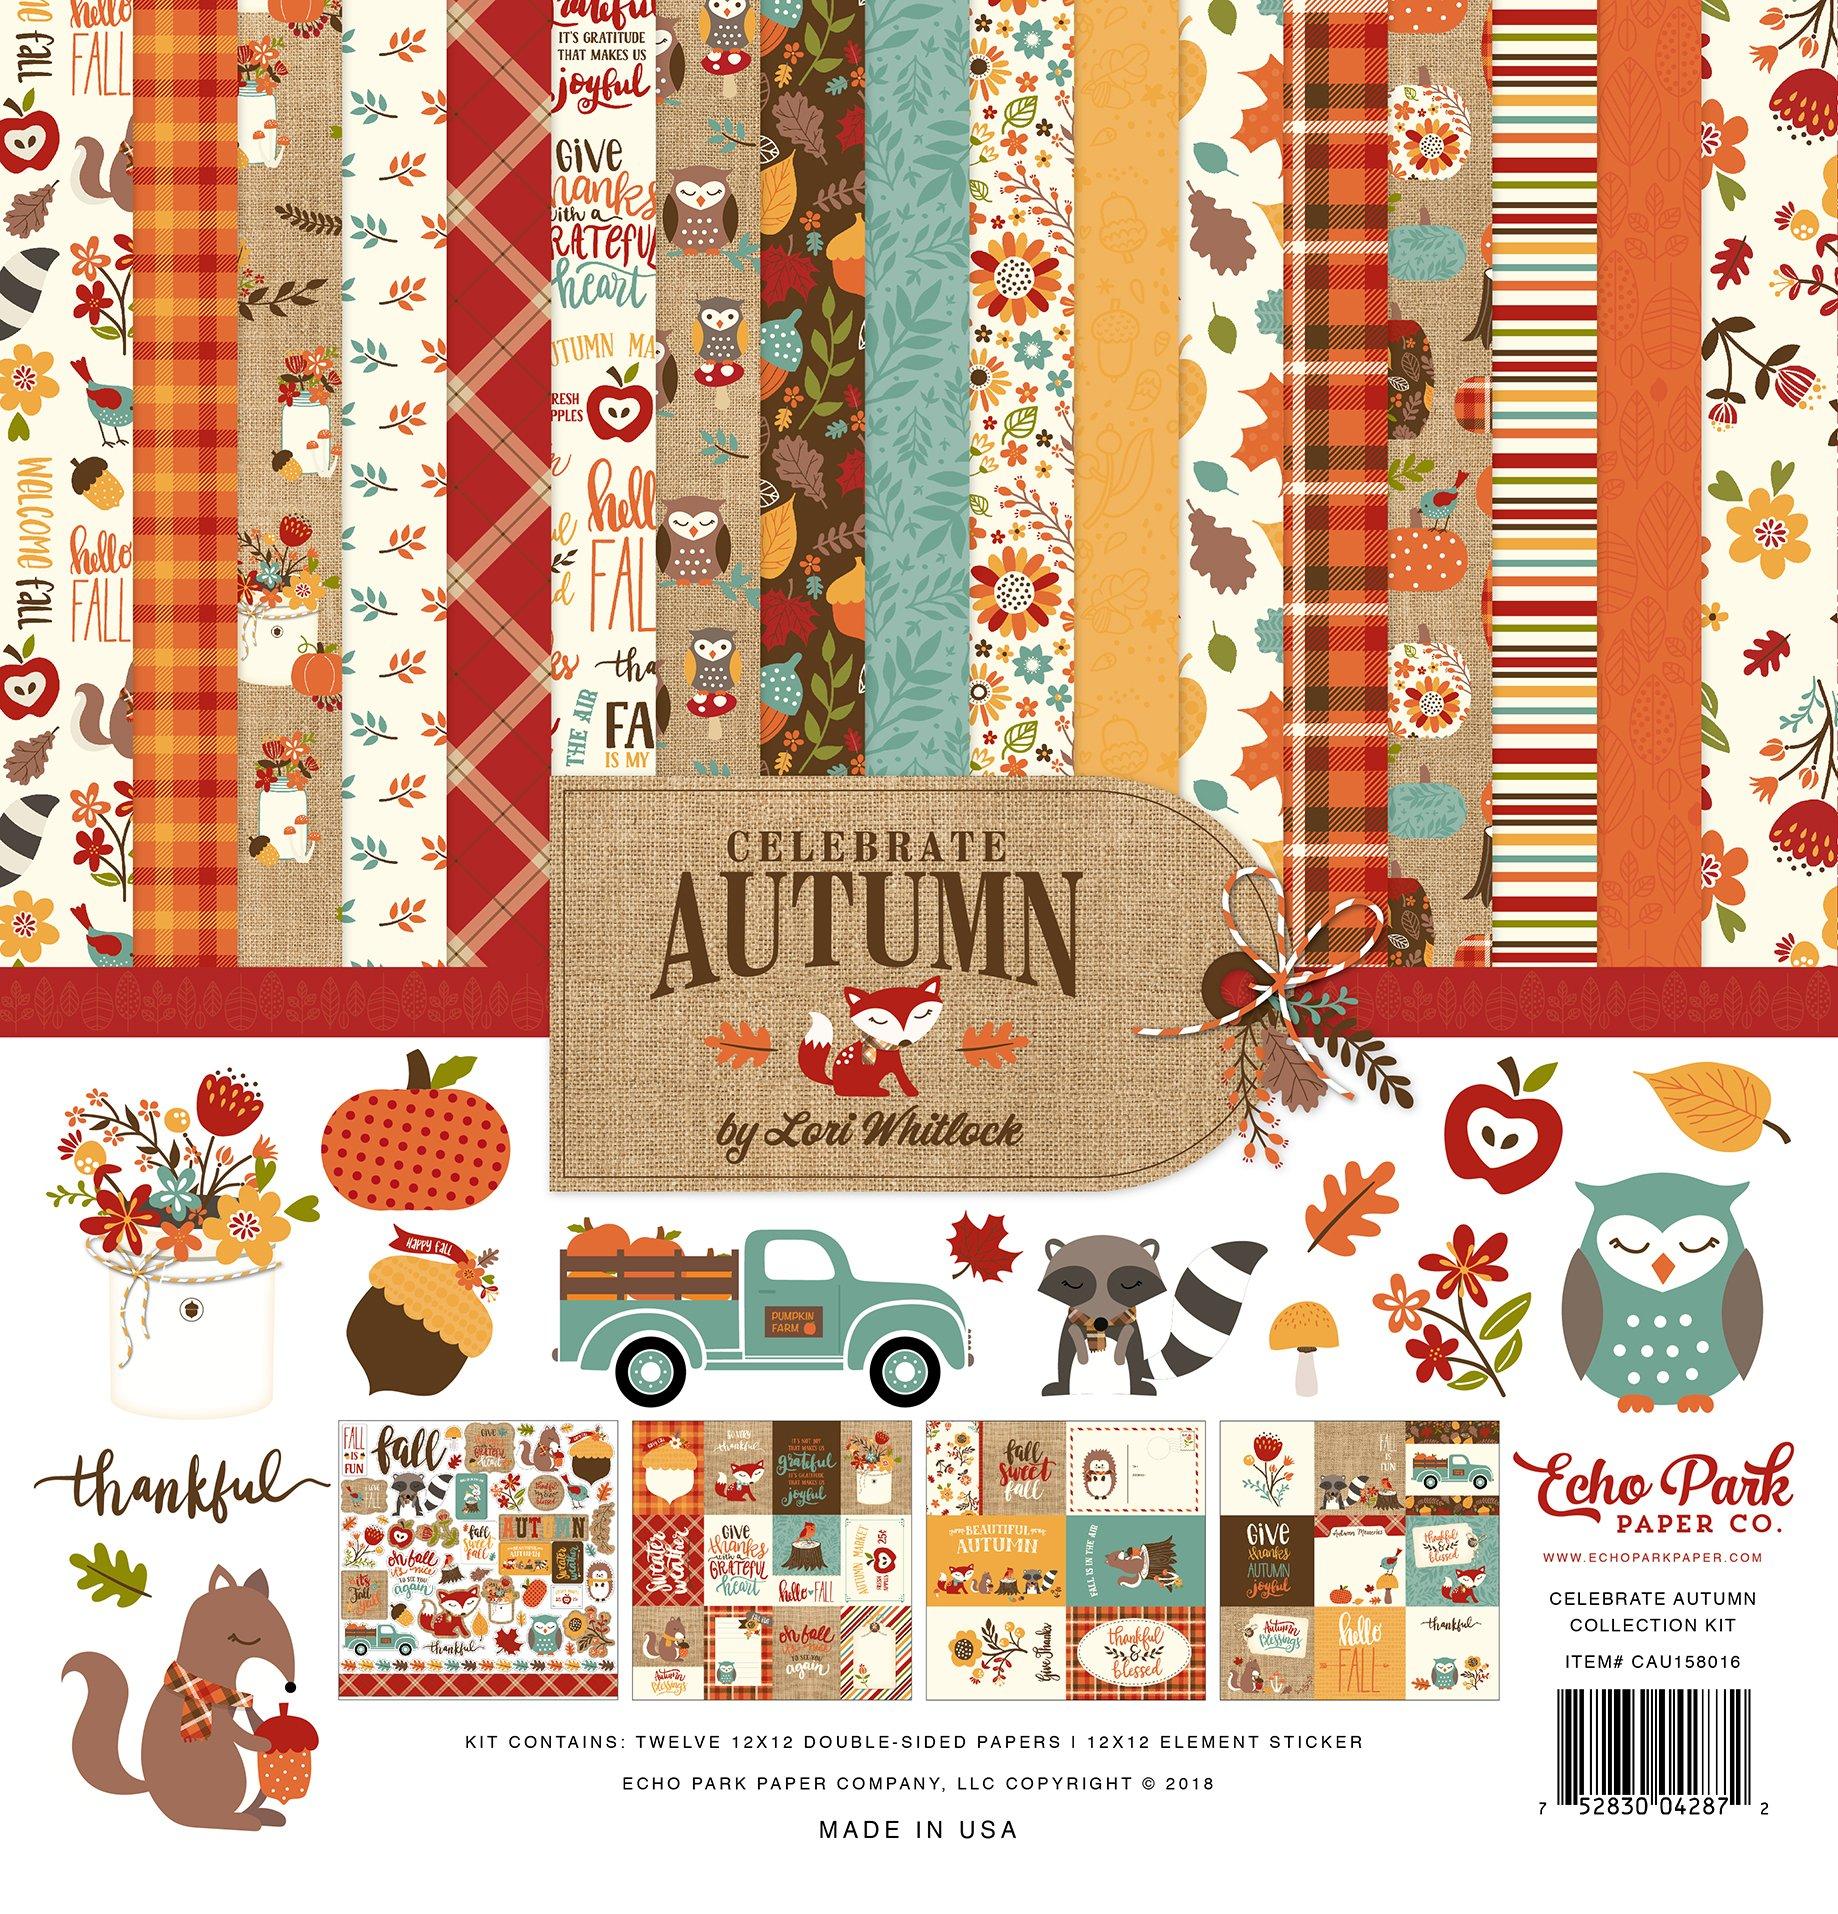 Echo Park Paper Company CAU158016 Celebrate Autumn Collection Kit, Orange, Yellow, Blue, Brown, Tan